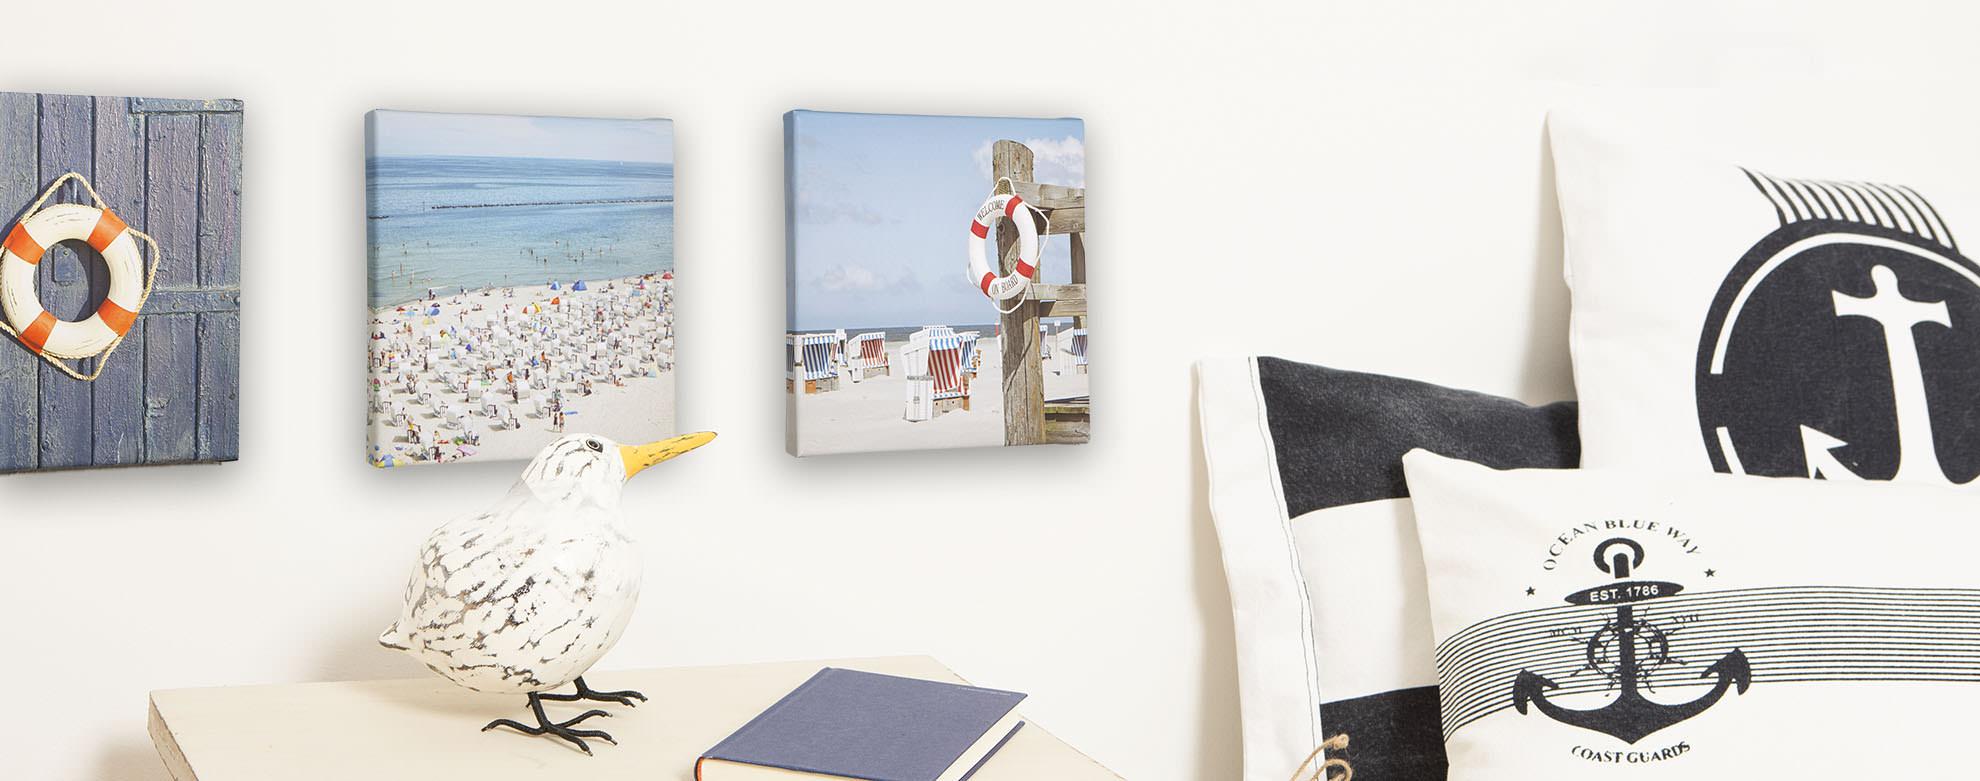 leinwandbilder nordsee online bestellen mare me maritime dekoration geschenke. Black Bedroom Furniture Sets. Home Design Ideas